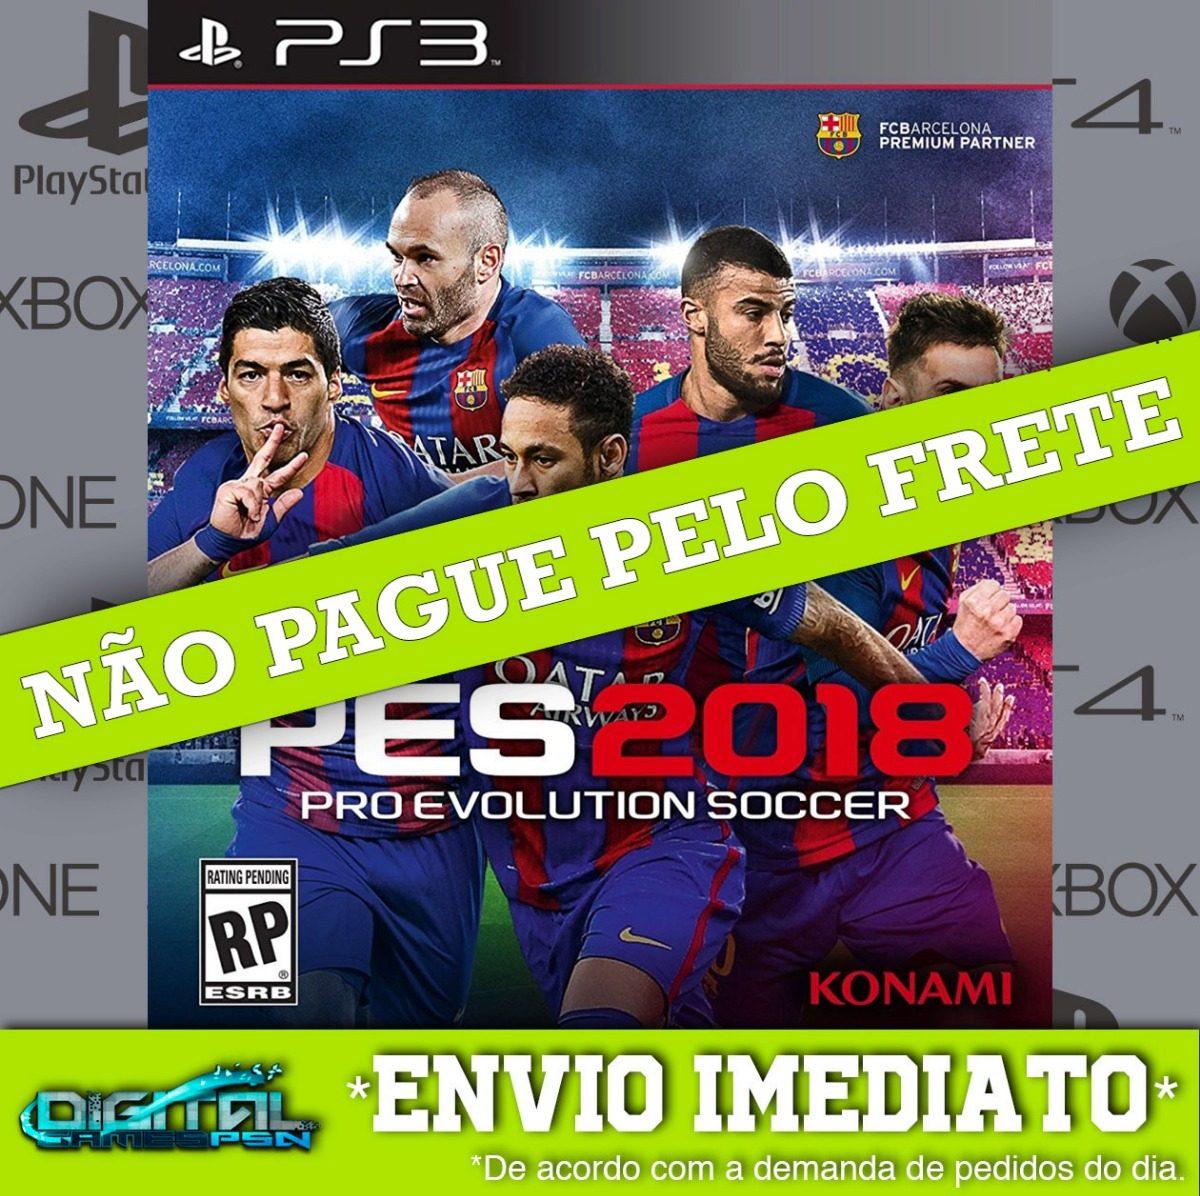 Pes 18 Pro Evolution Soccer 2018 Ps3 100% Digital Dublado Pt